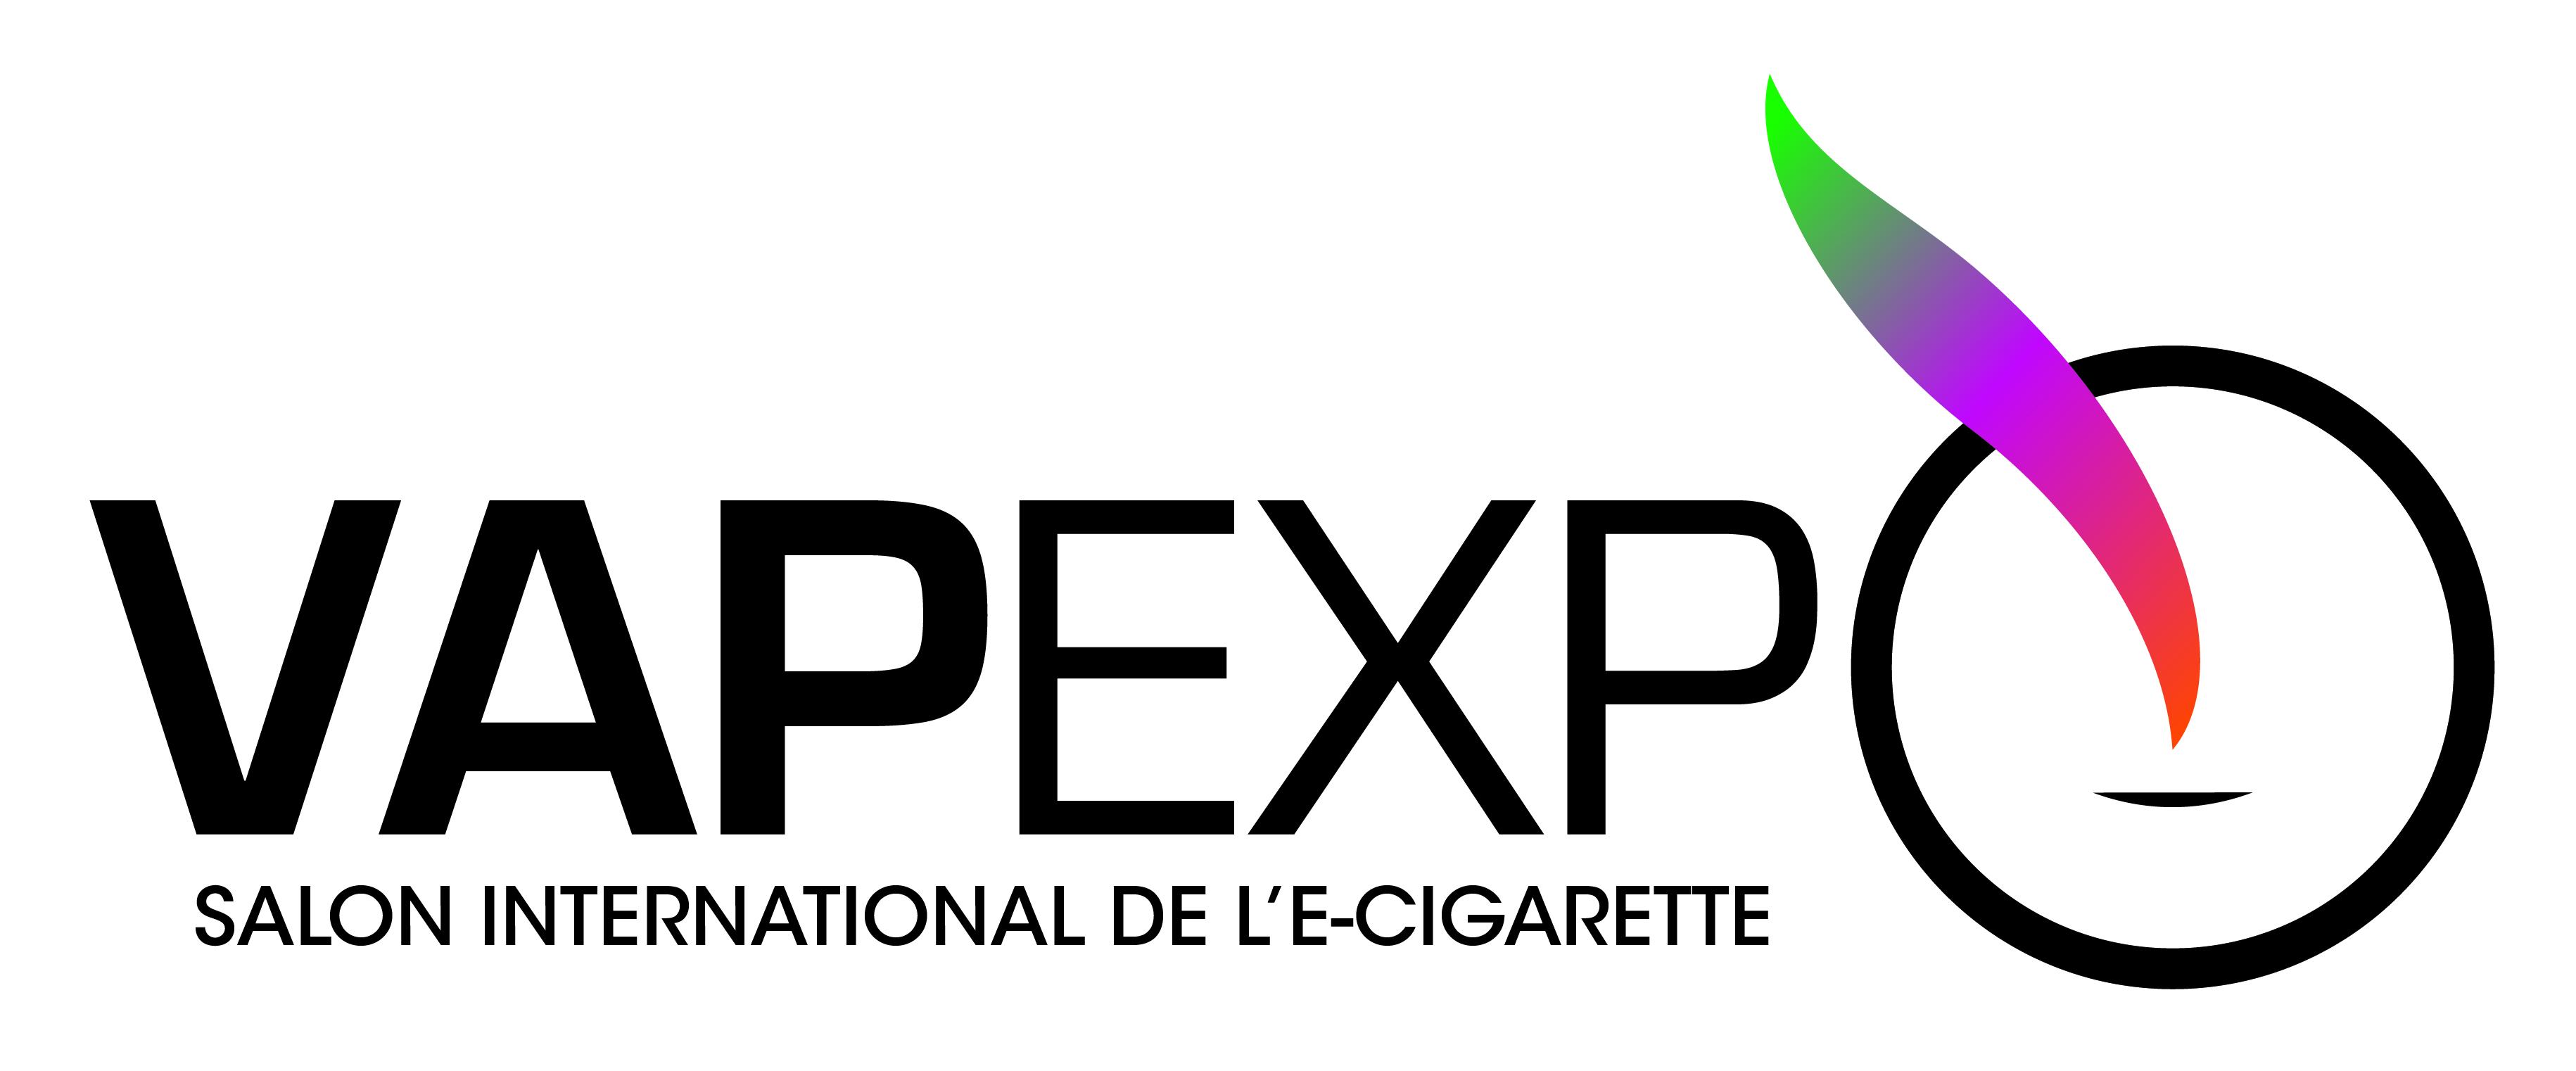 Fafad_Vape_logo_vapexpo_fr.jpg